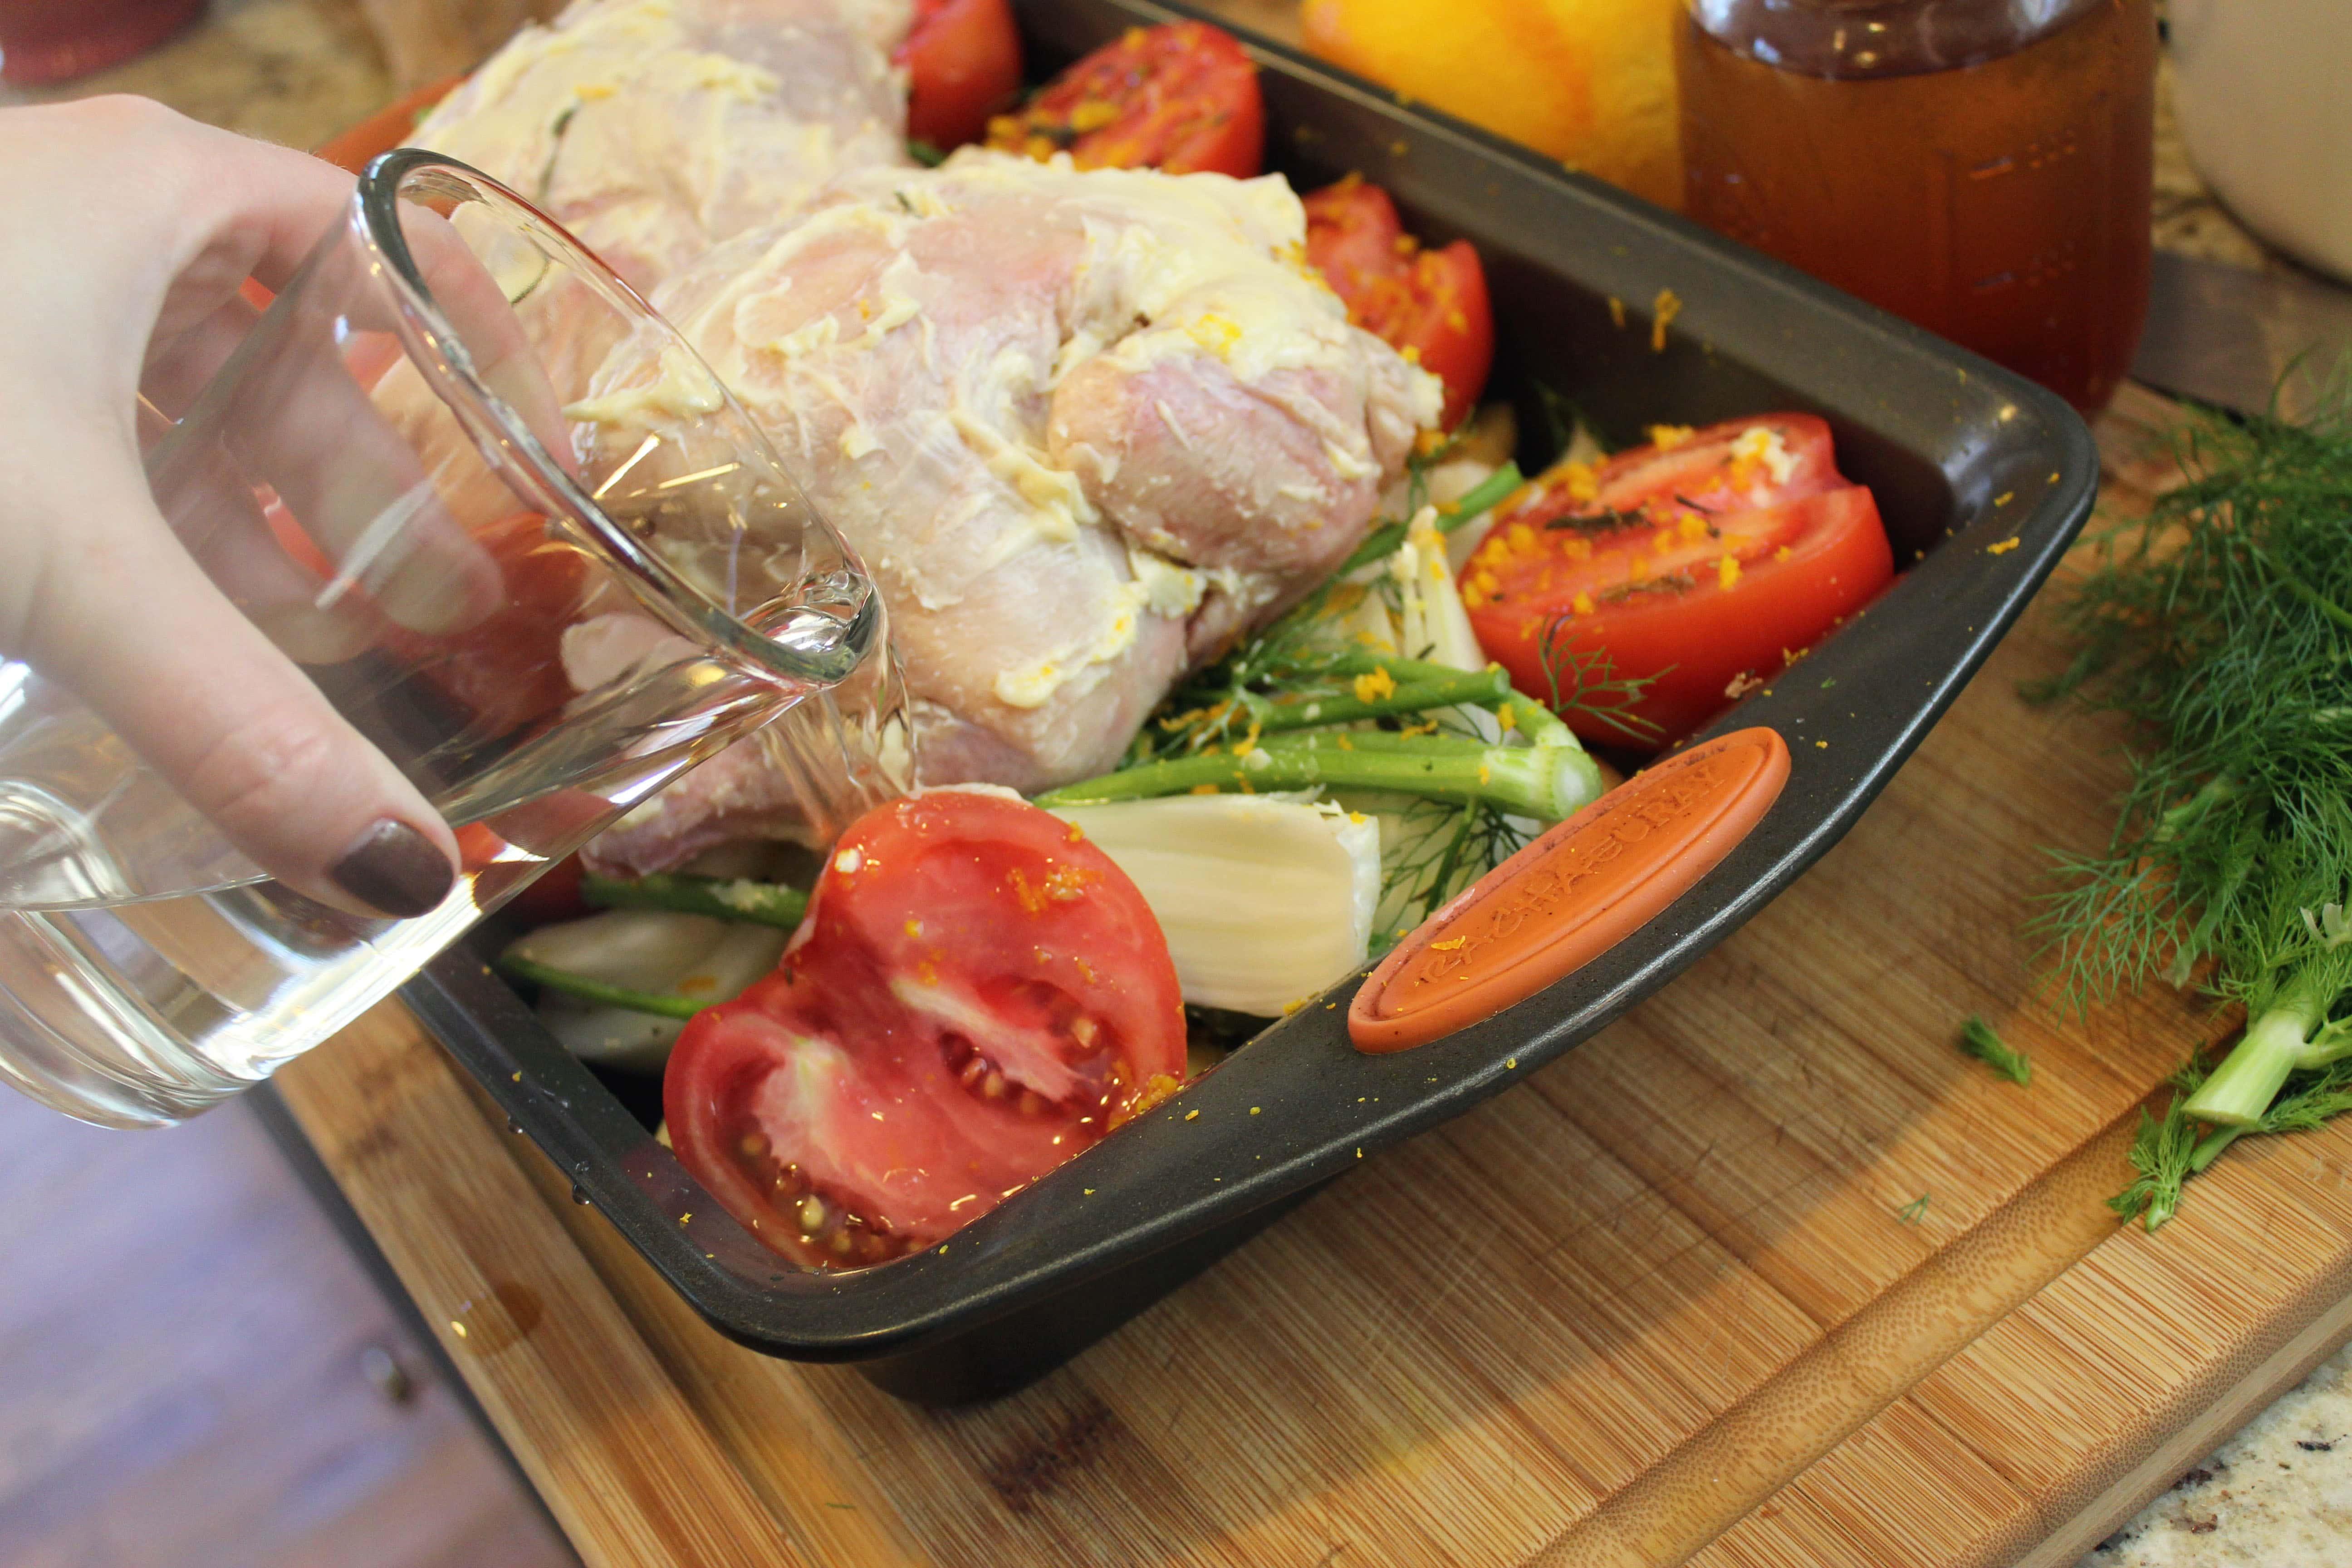 Pour wine into roasting pan